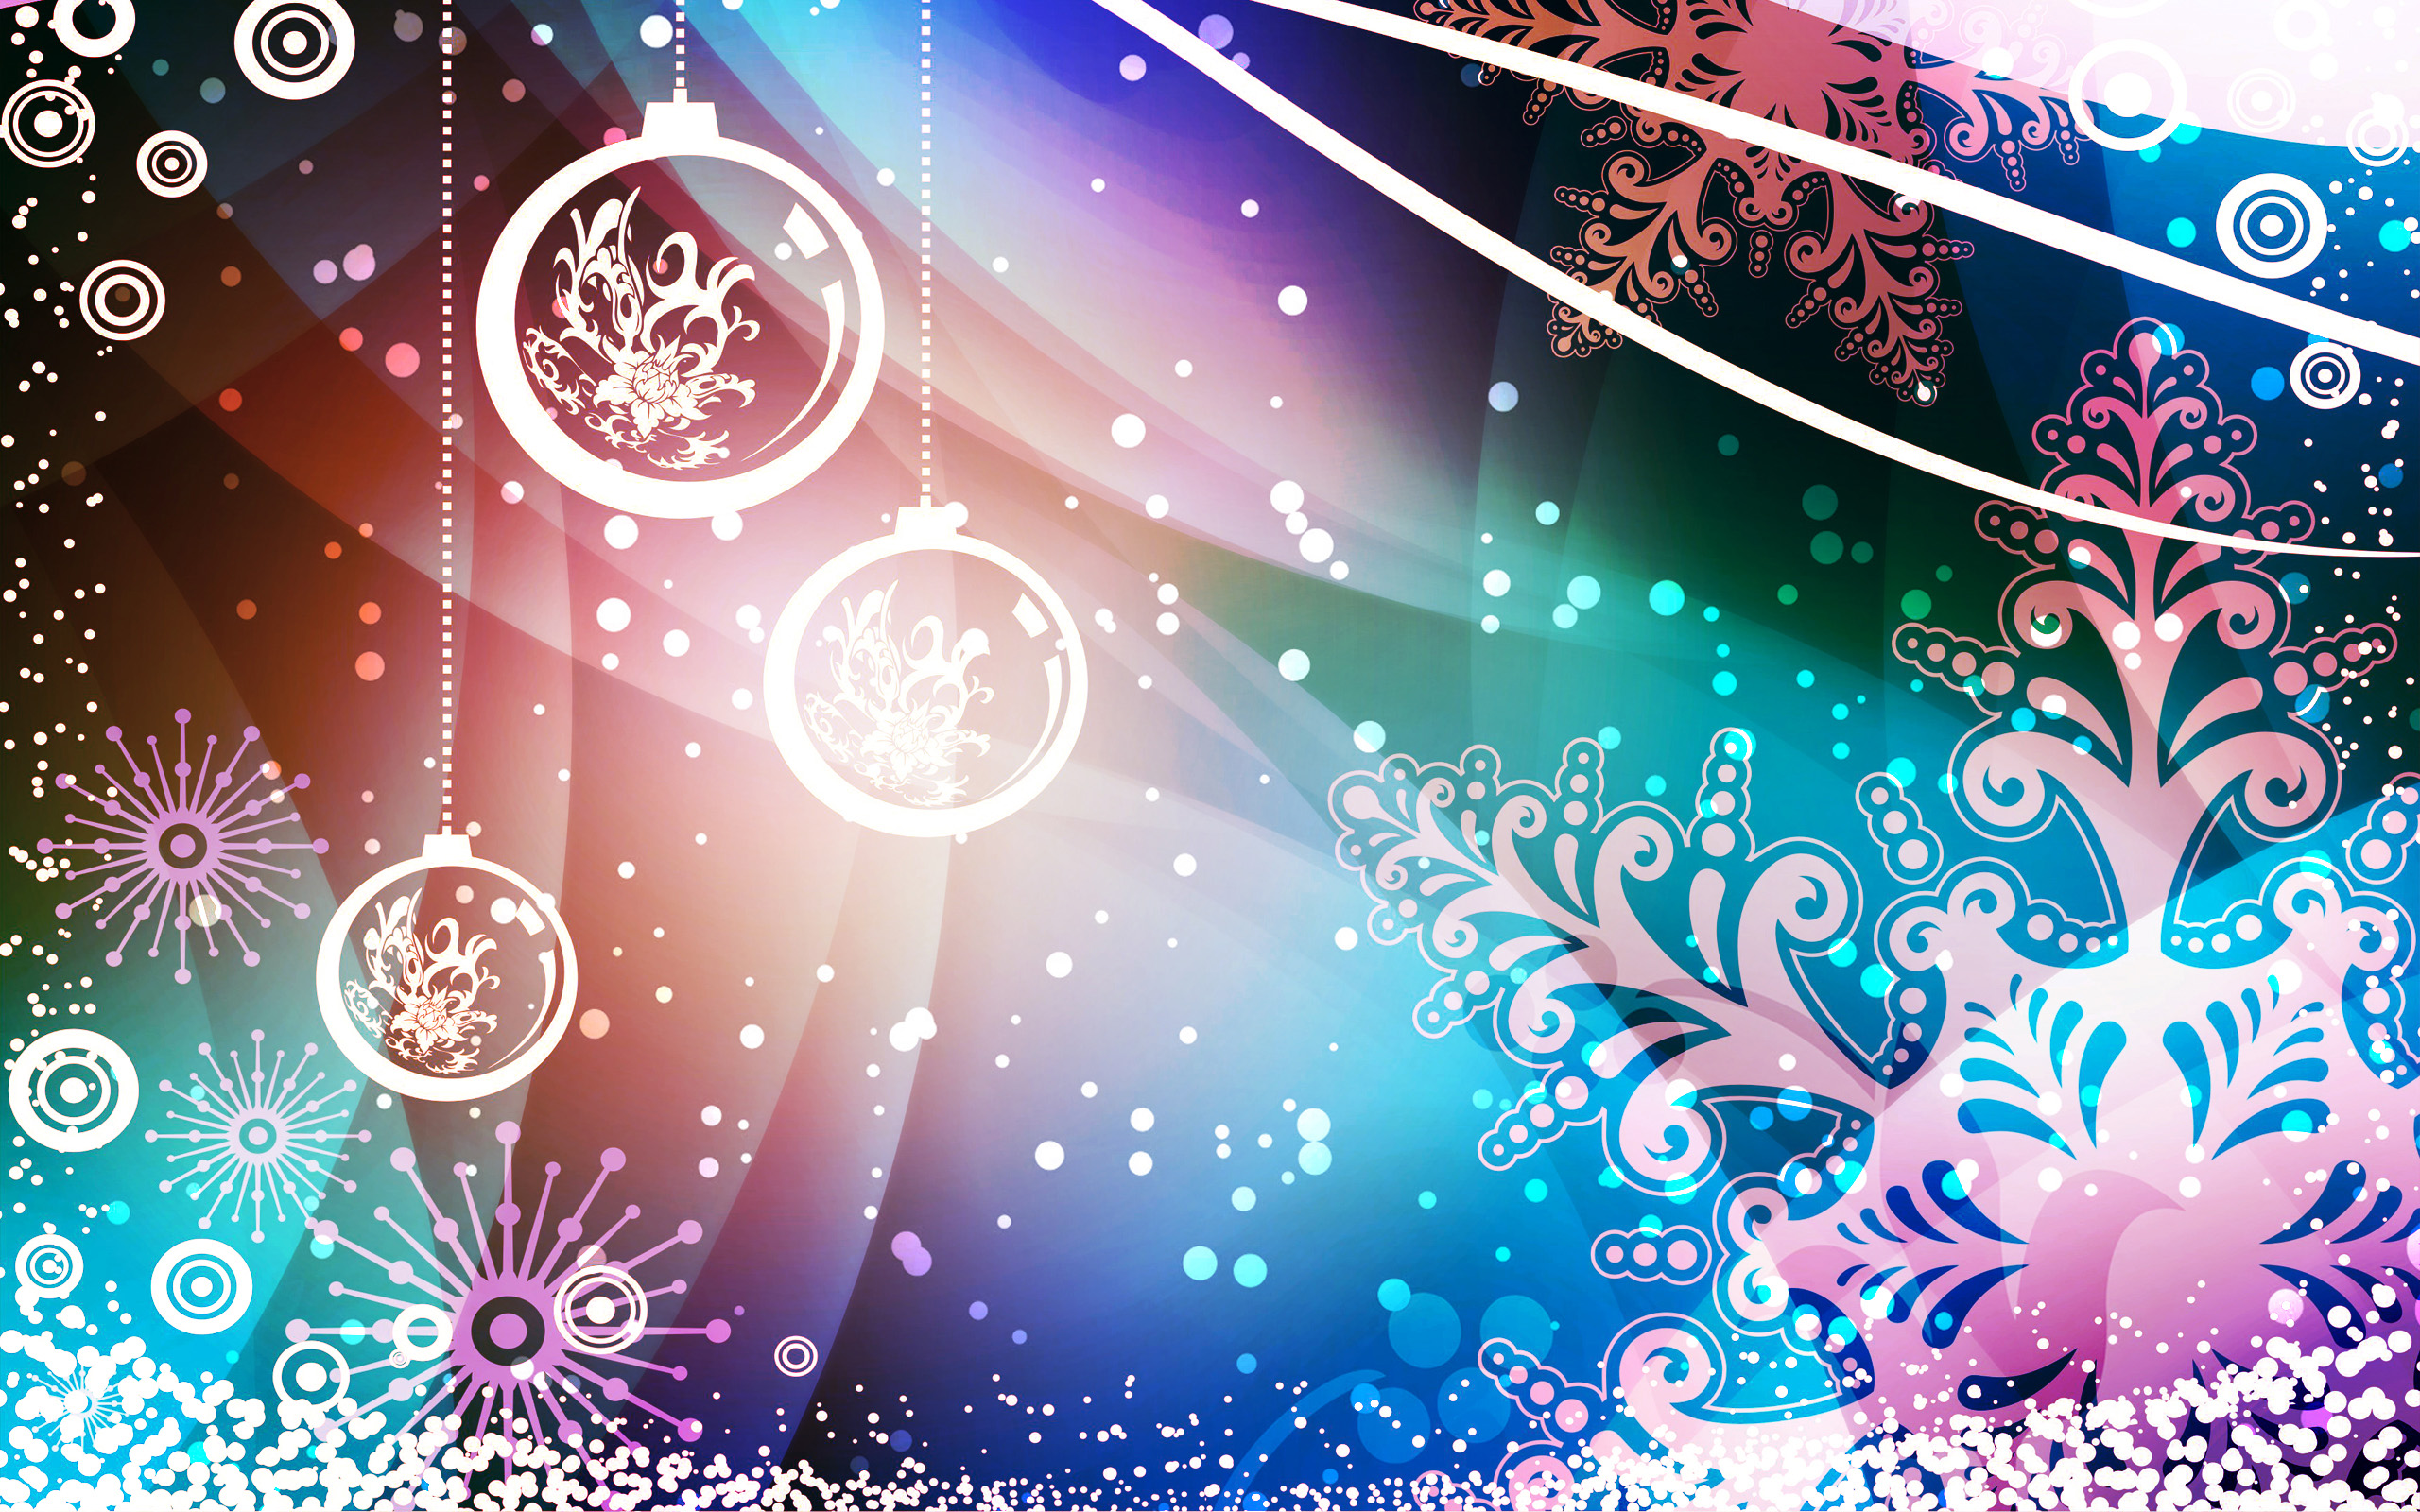 Christmas Backgrounds 6919599 2560x1600